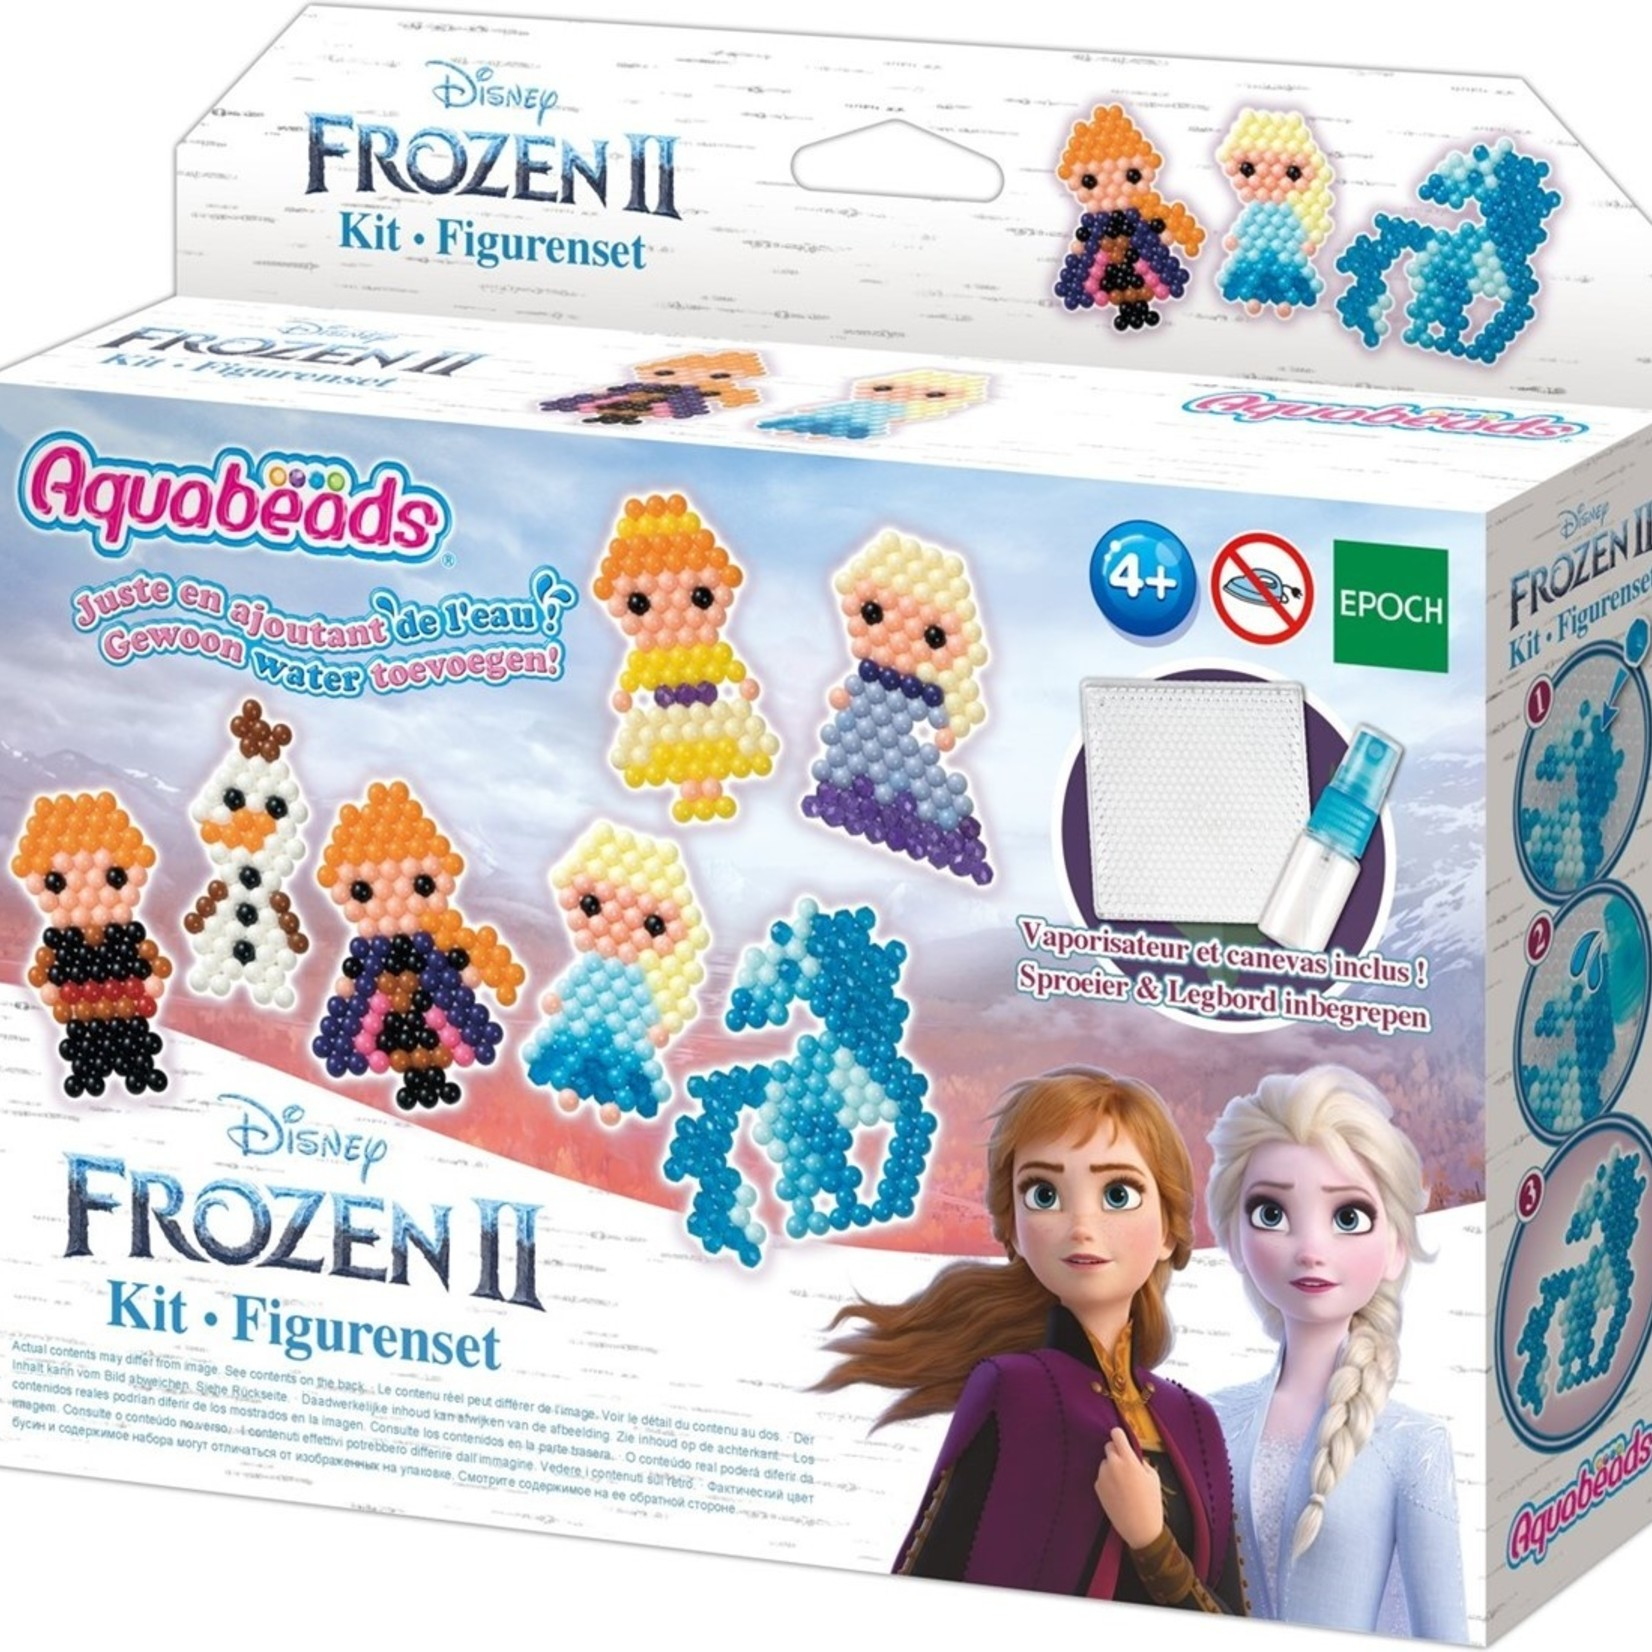 Aquabeads Frozen 2 figurenset